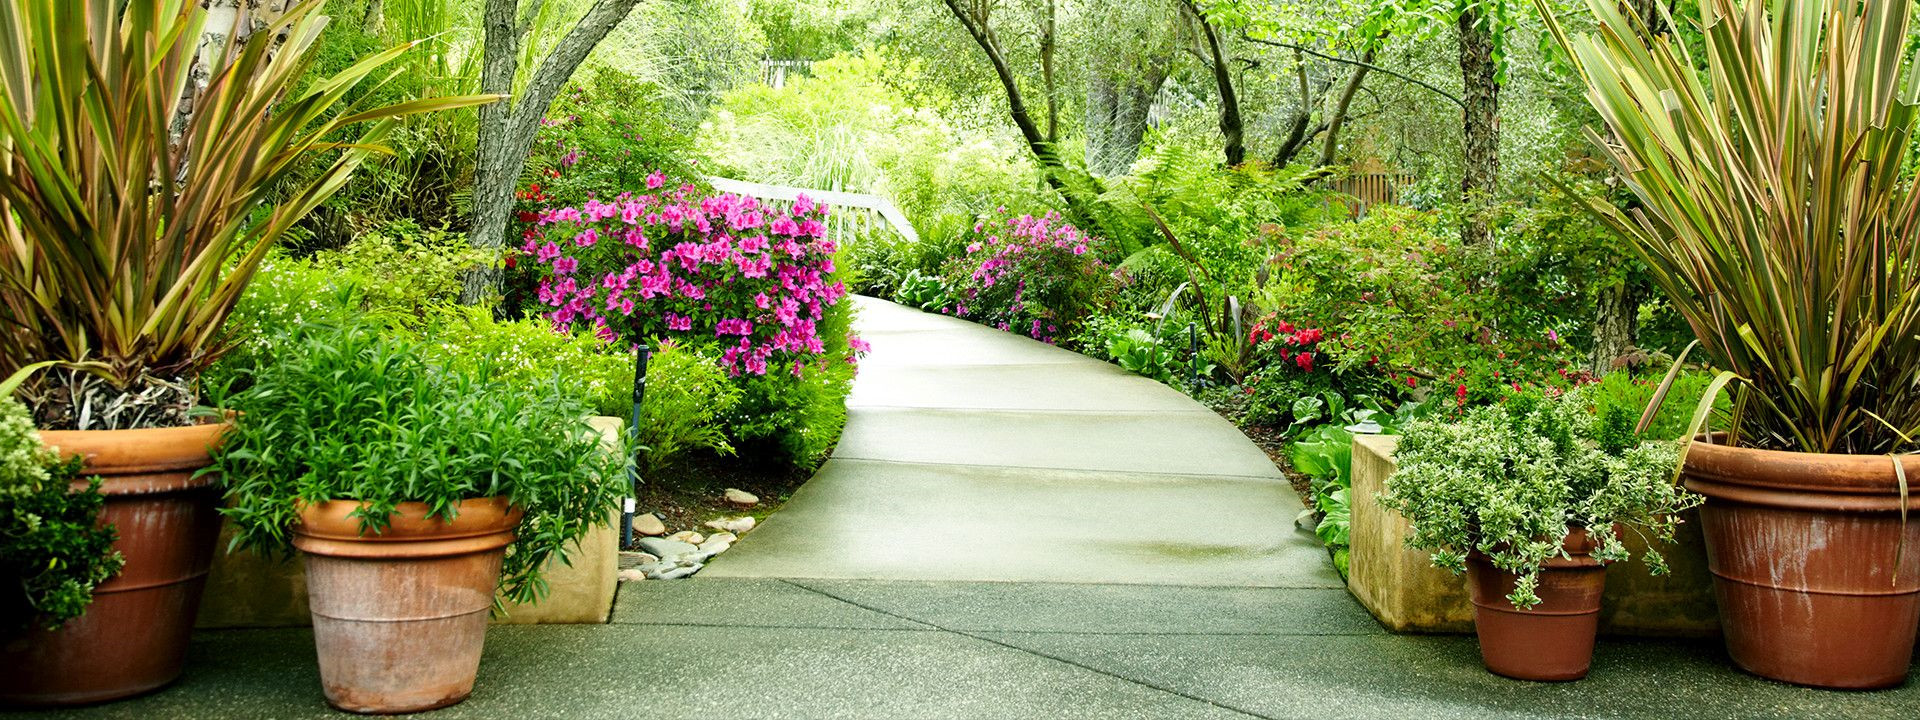 Funeral Assistance FEMA | Schoedinger Funeral Home